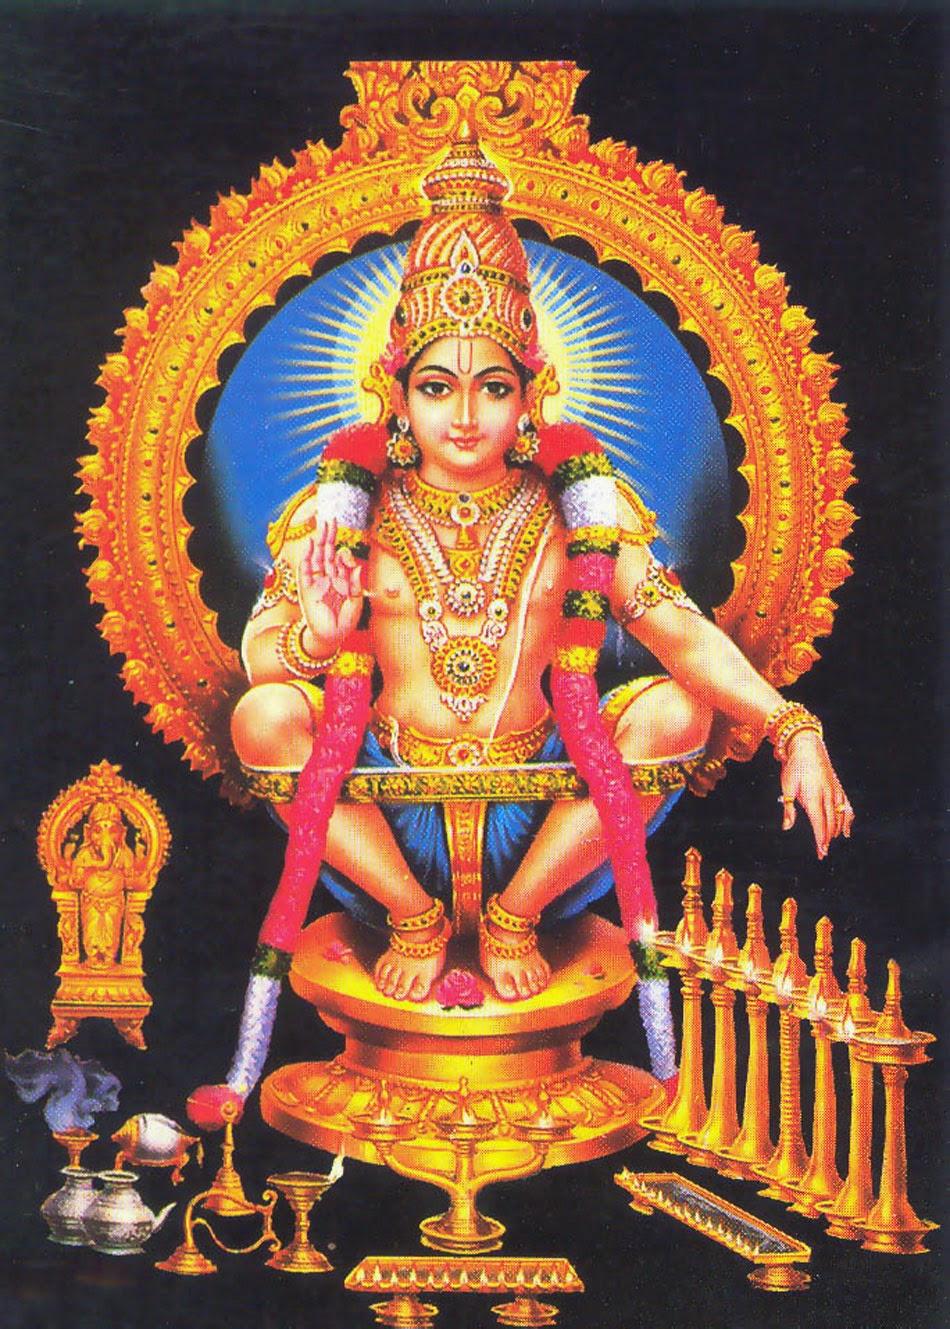 Popular Wallpaper High Quality Lord Ayyappa - Lord%2BAyyappa%2BSwamy%2Bhd%2Bwallpapers%2B(11)  HD_77436.jpg